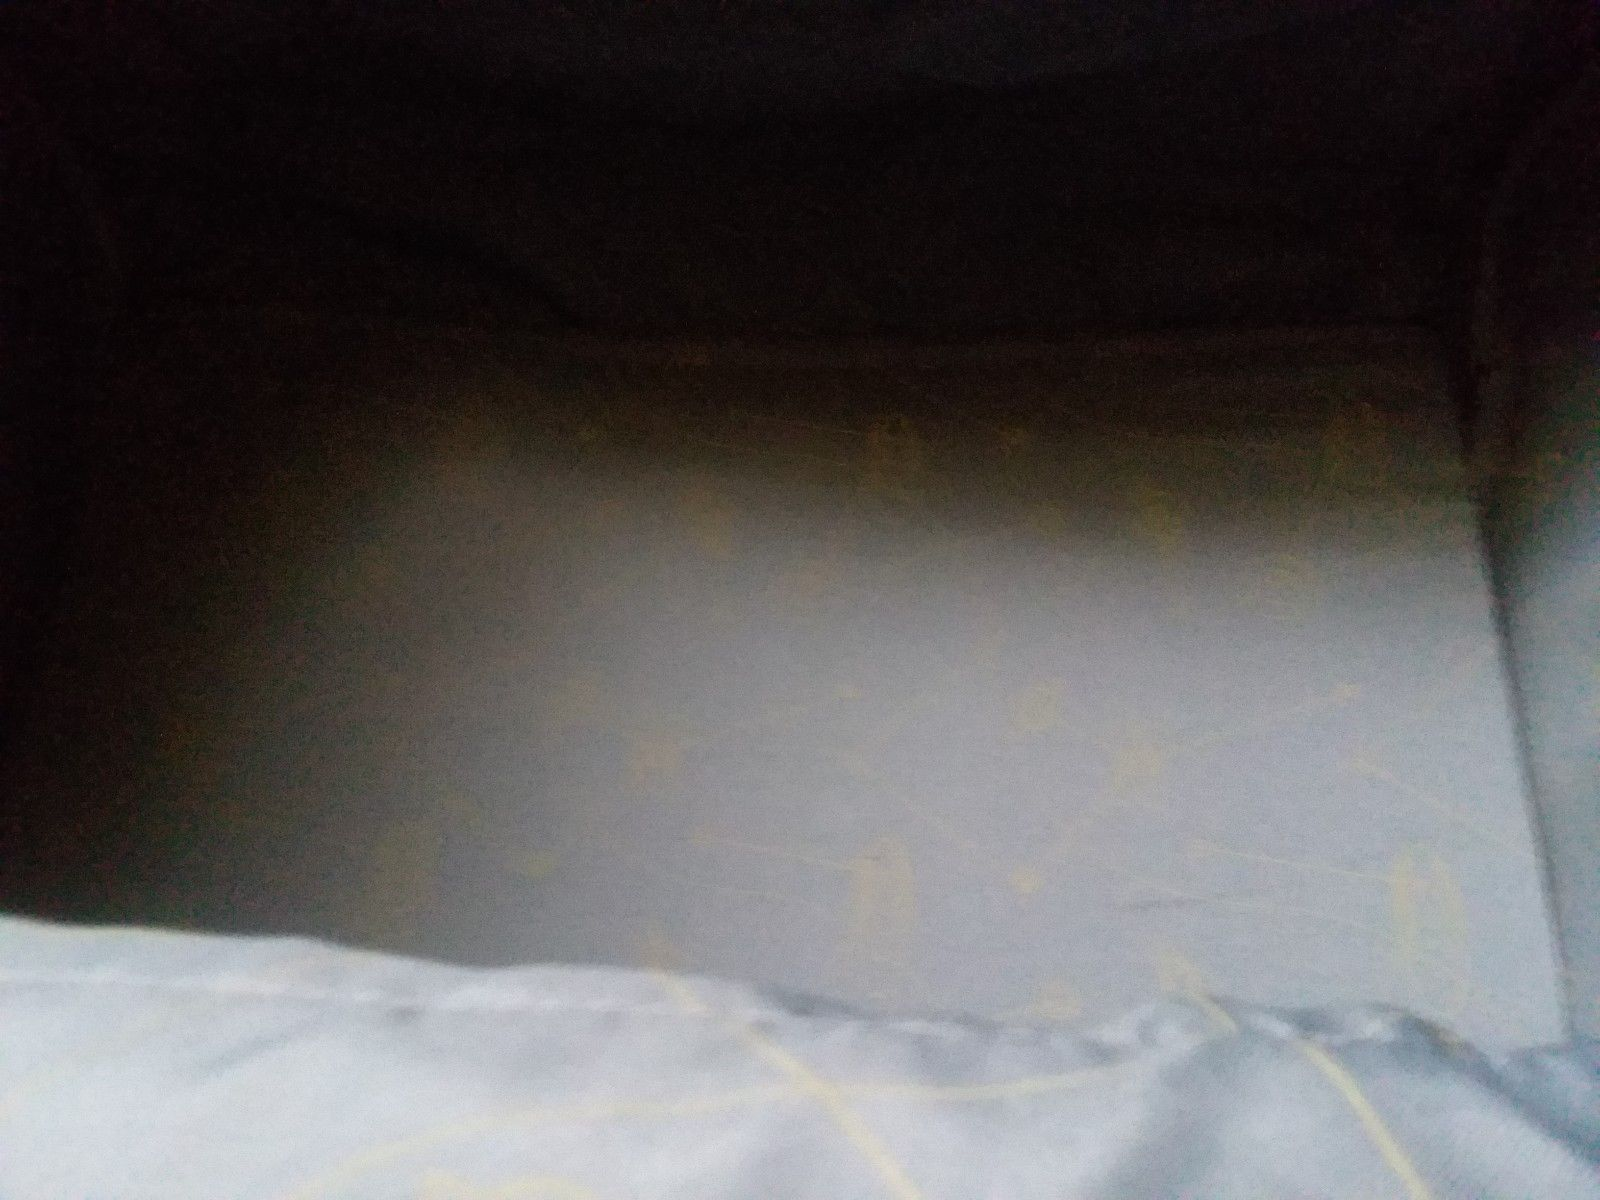 Samsonite Gray Yellow Travel Case Duffel Luggage image 9